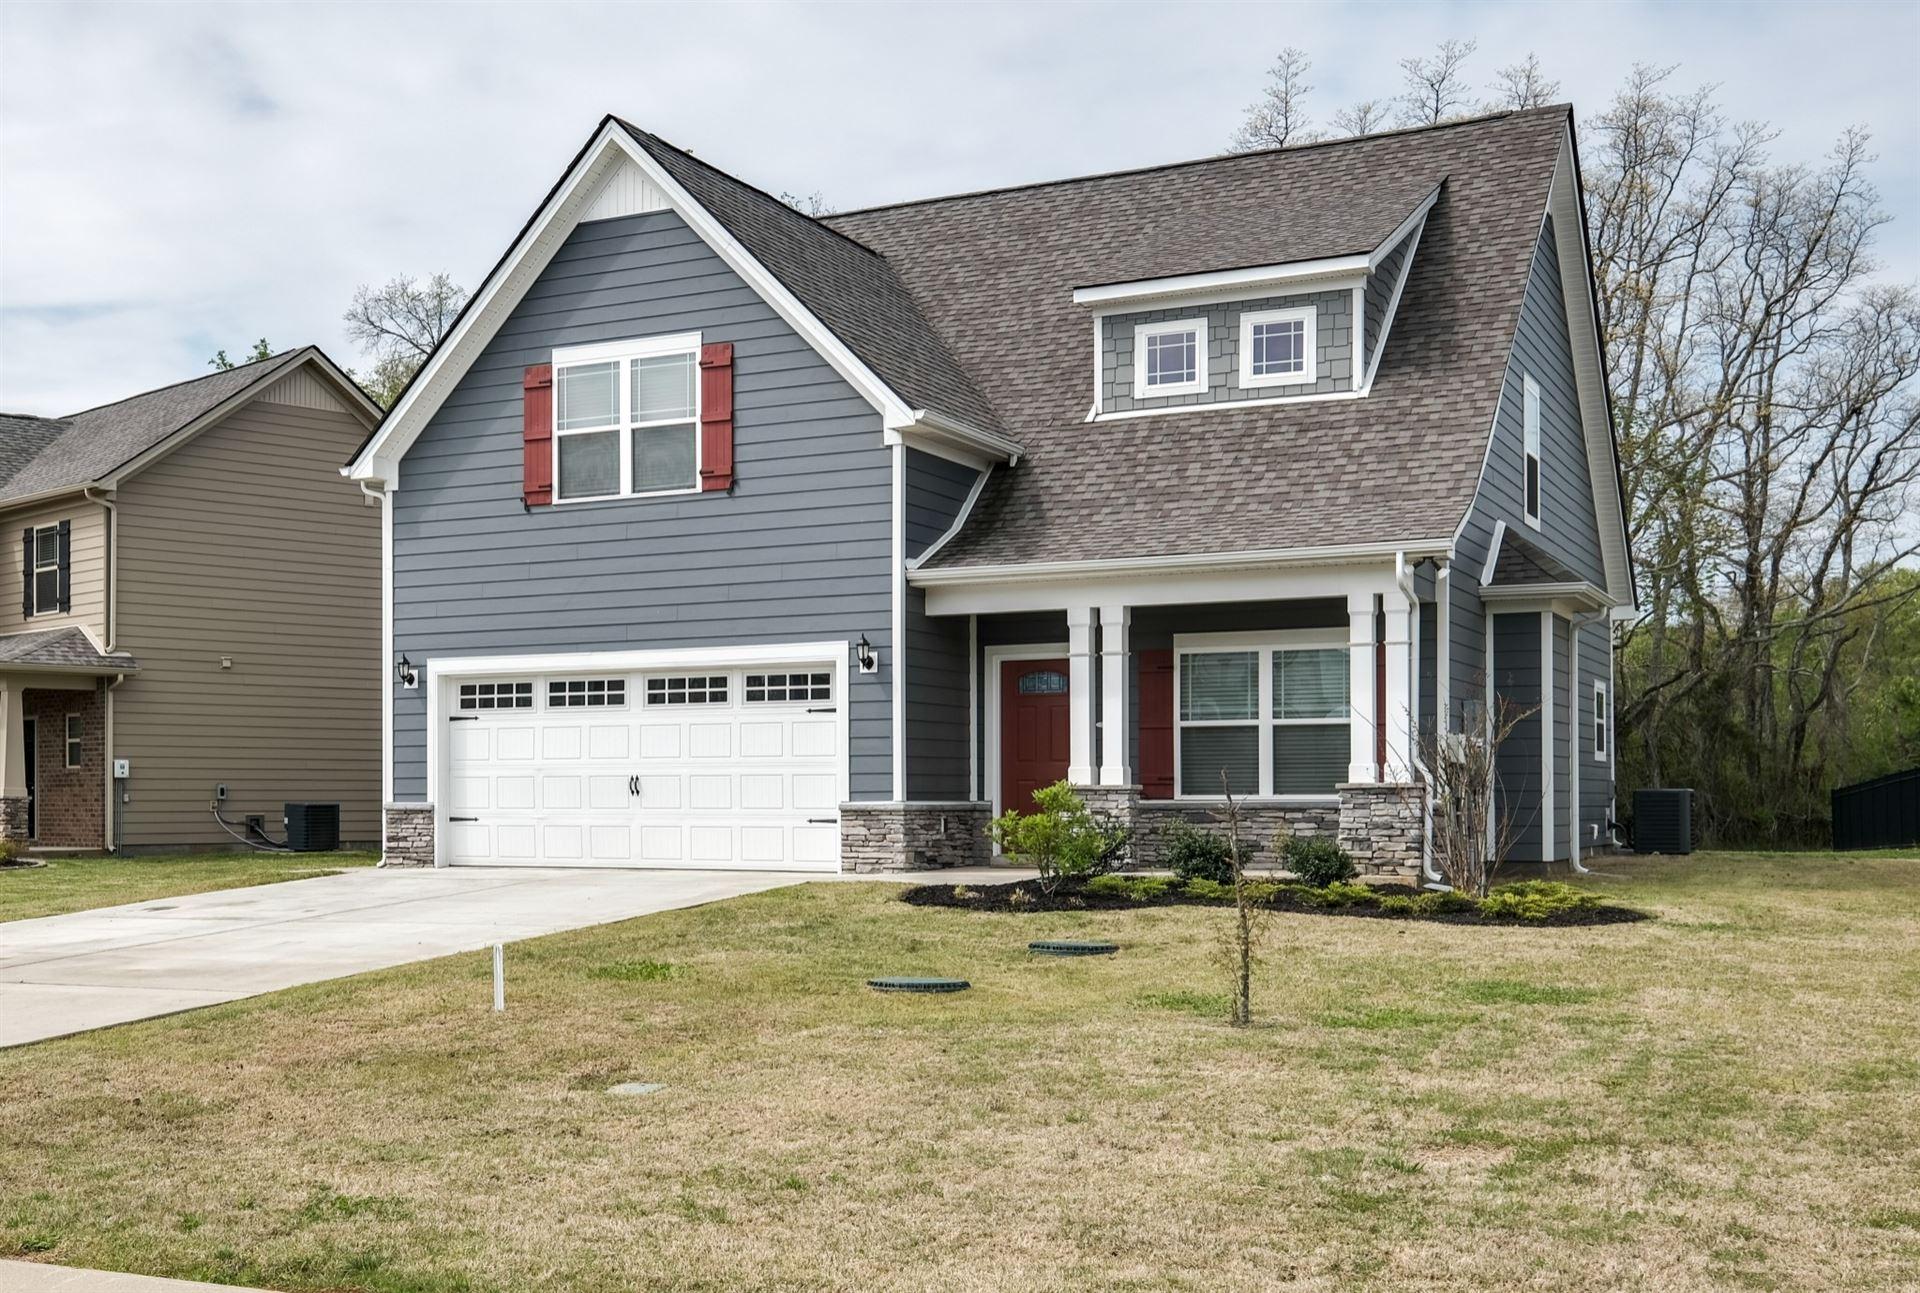 Photo of 1266 Cotillion Dr, Murfreesboro, TN 37128 (MLS # 2243438)